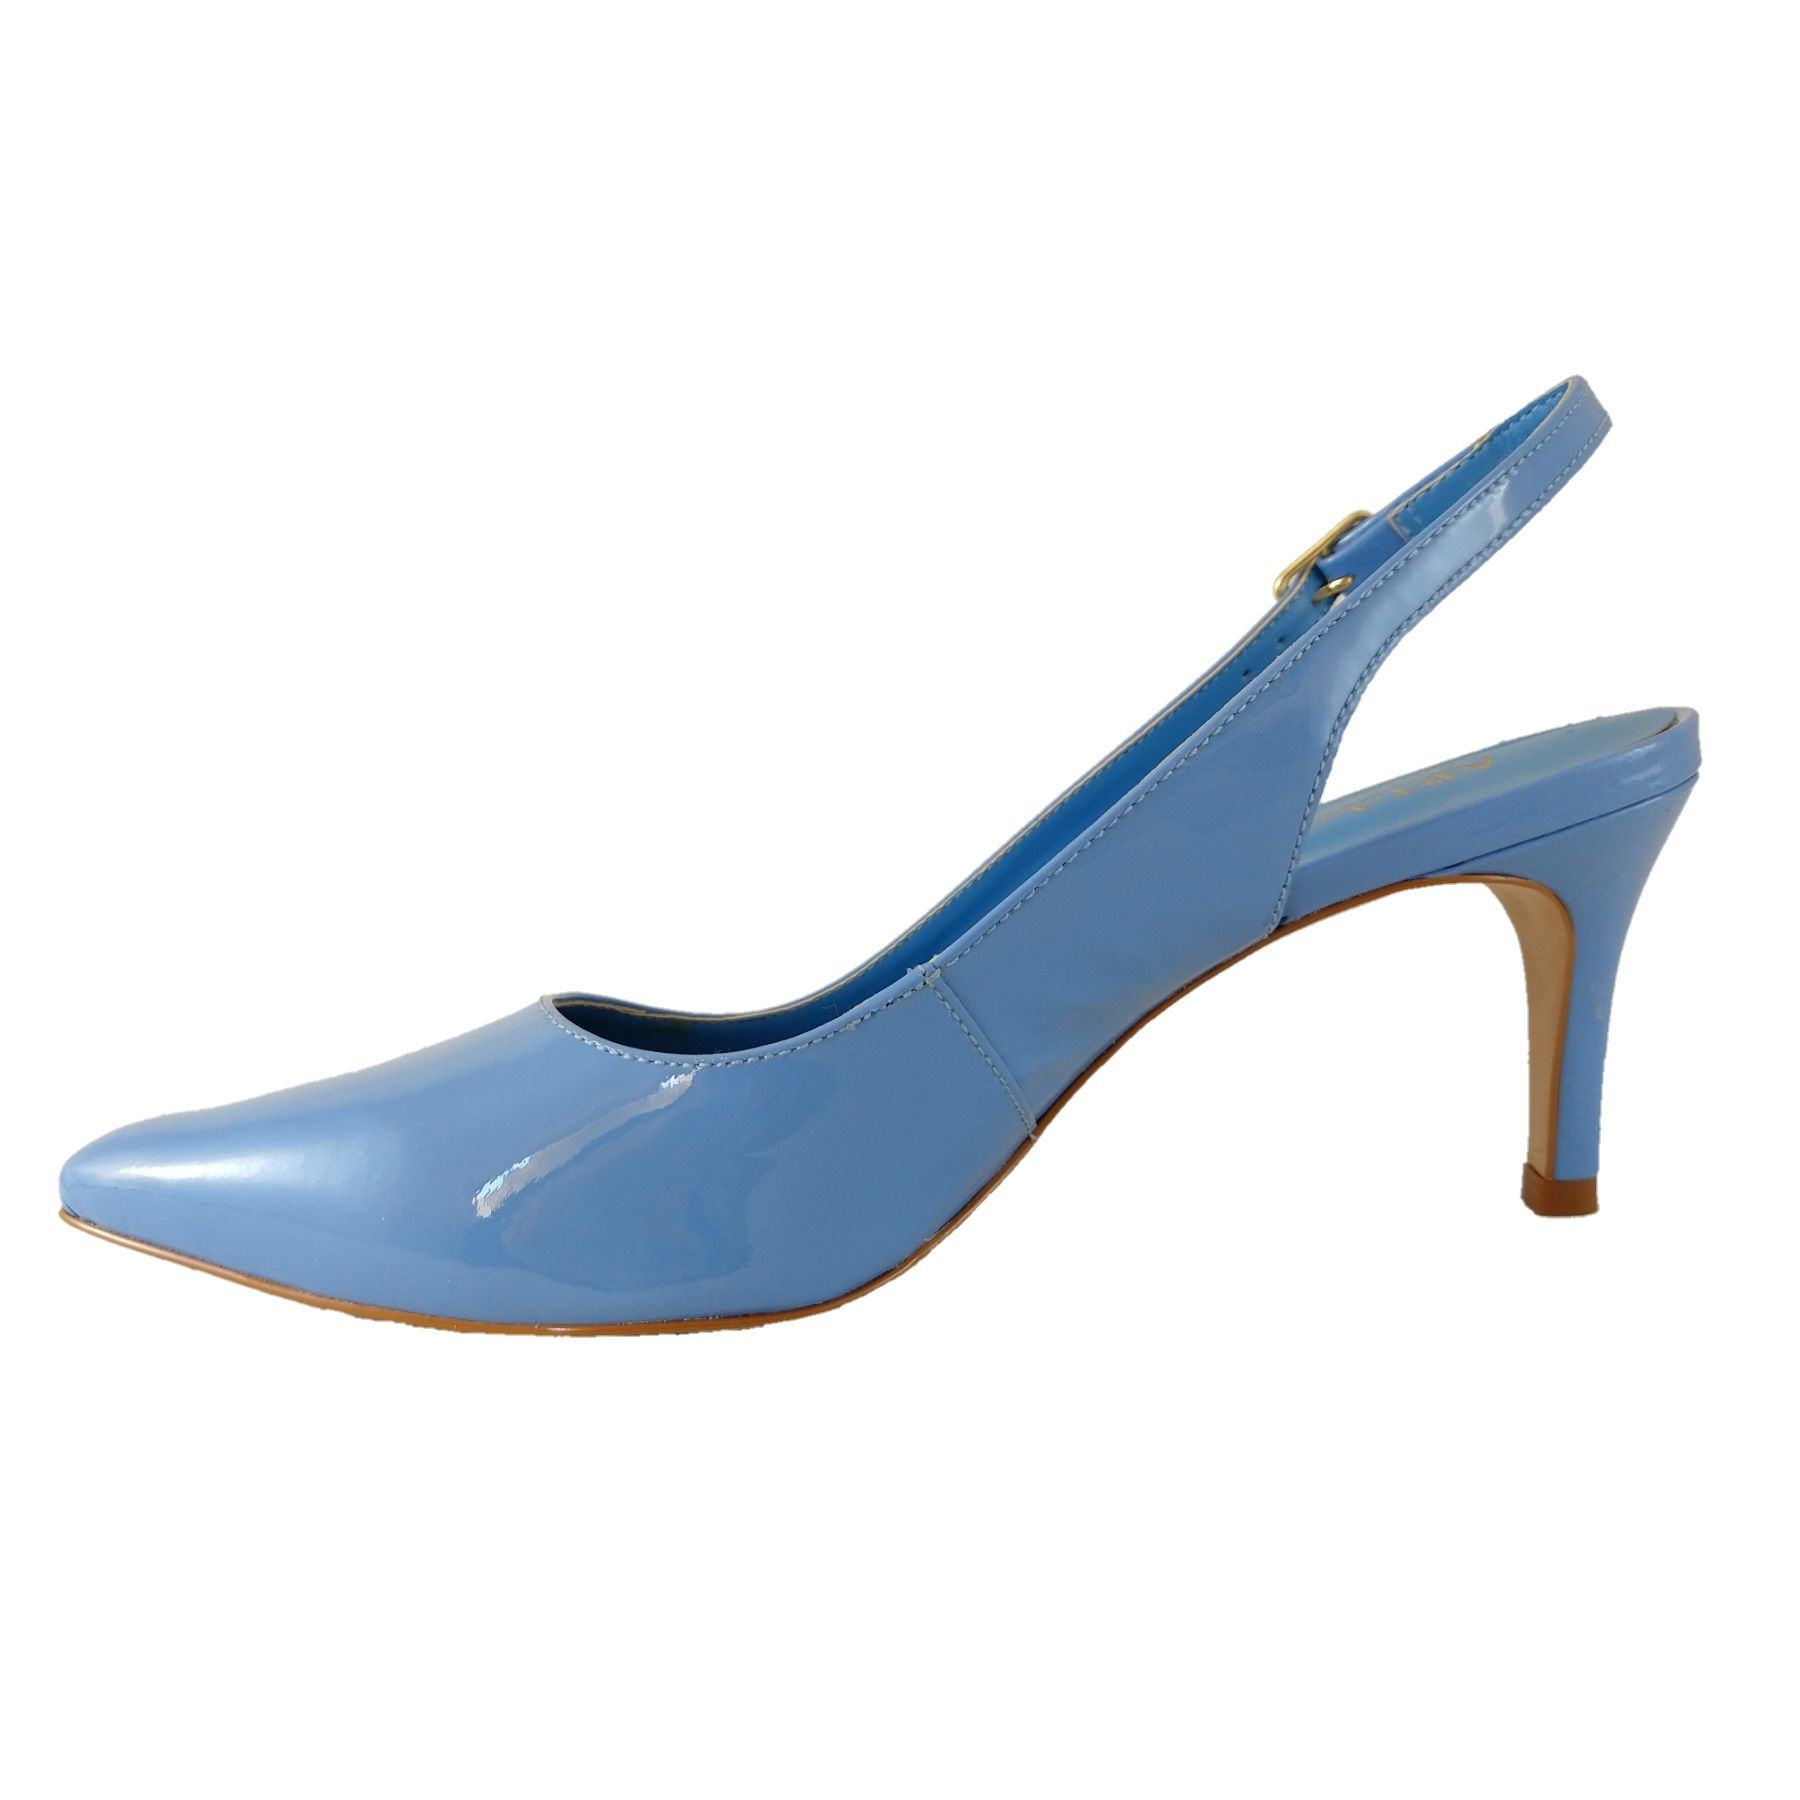 Scarpin Chanel SapatoWeb Verniz Azul  - SAPATOWEB.COM